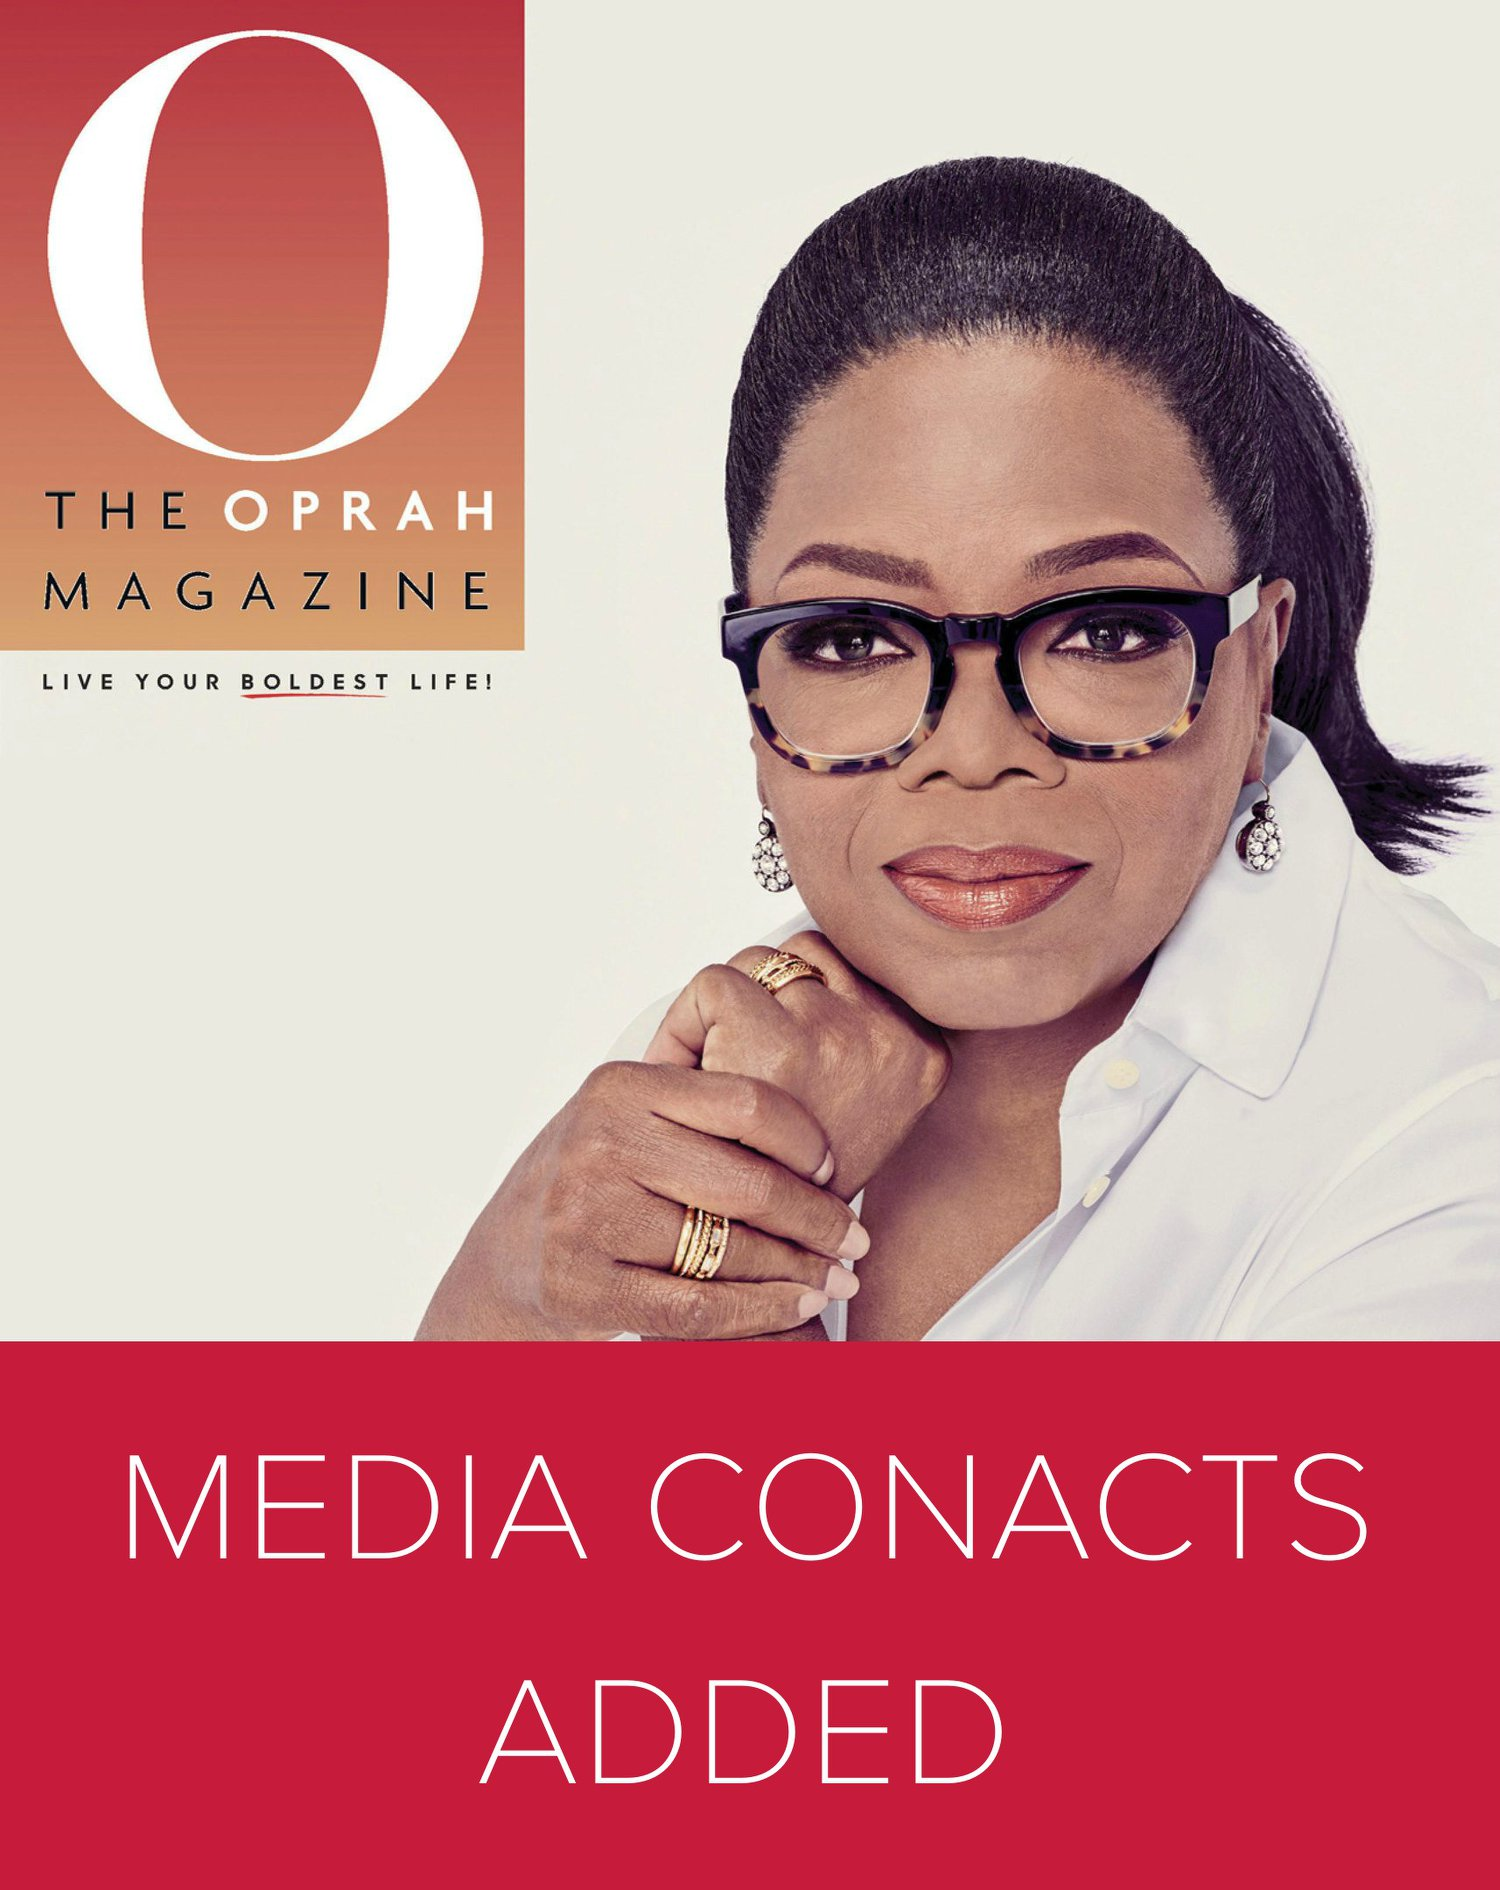 media contacts oprah.jpg